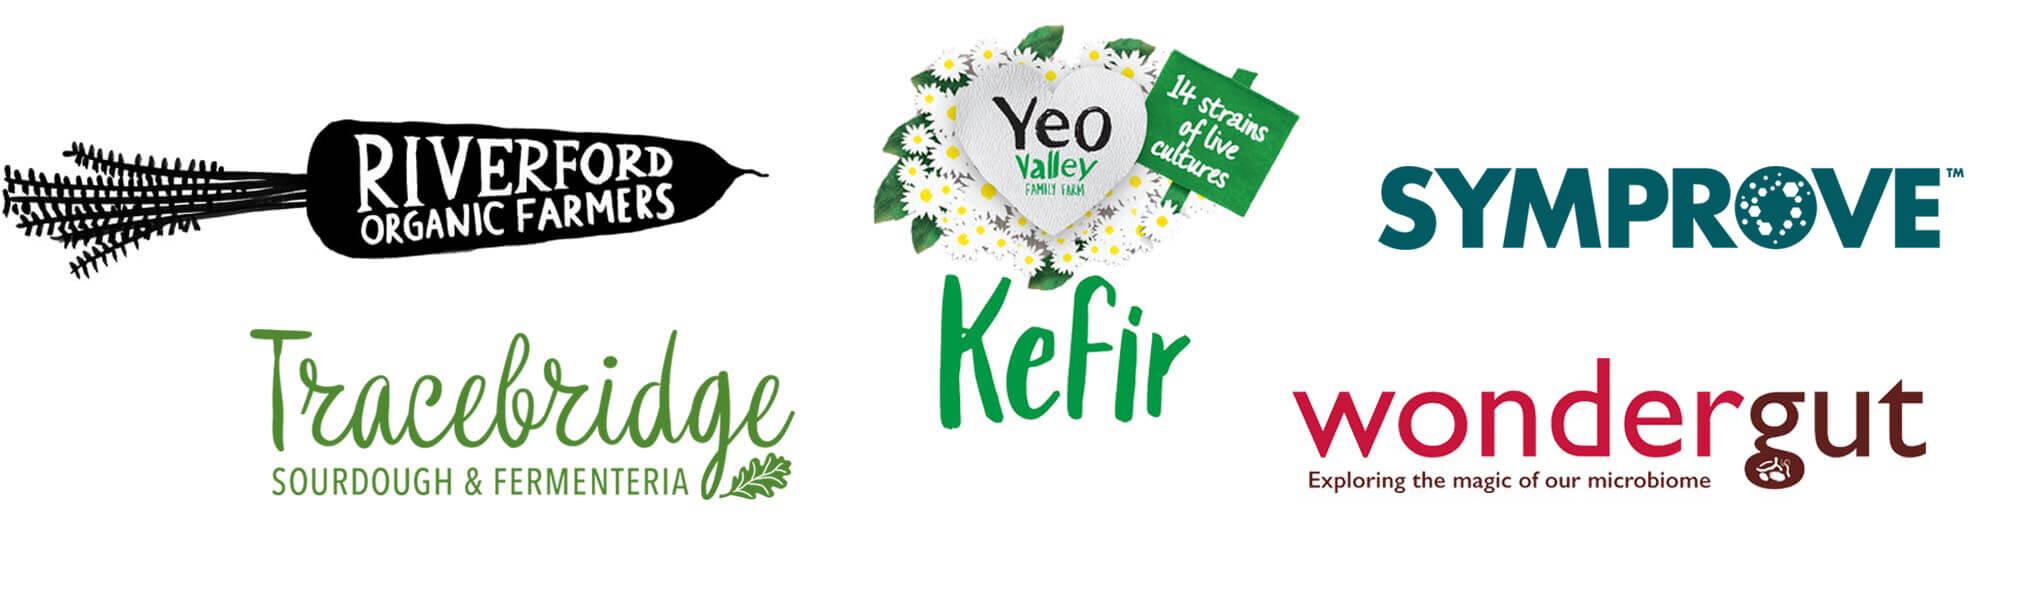 Sponsor logos, Riverford, Yeo Valley, Symprove, Tracebridge, Wondergut